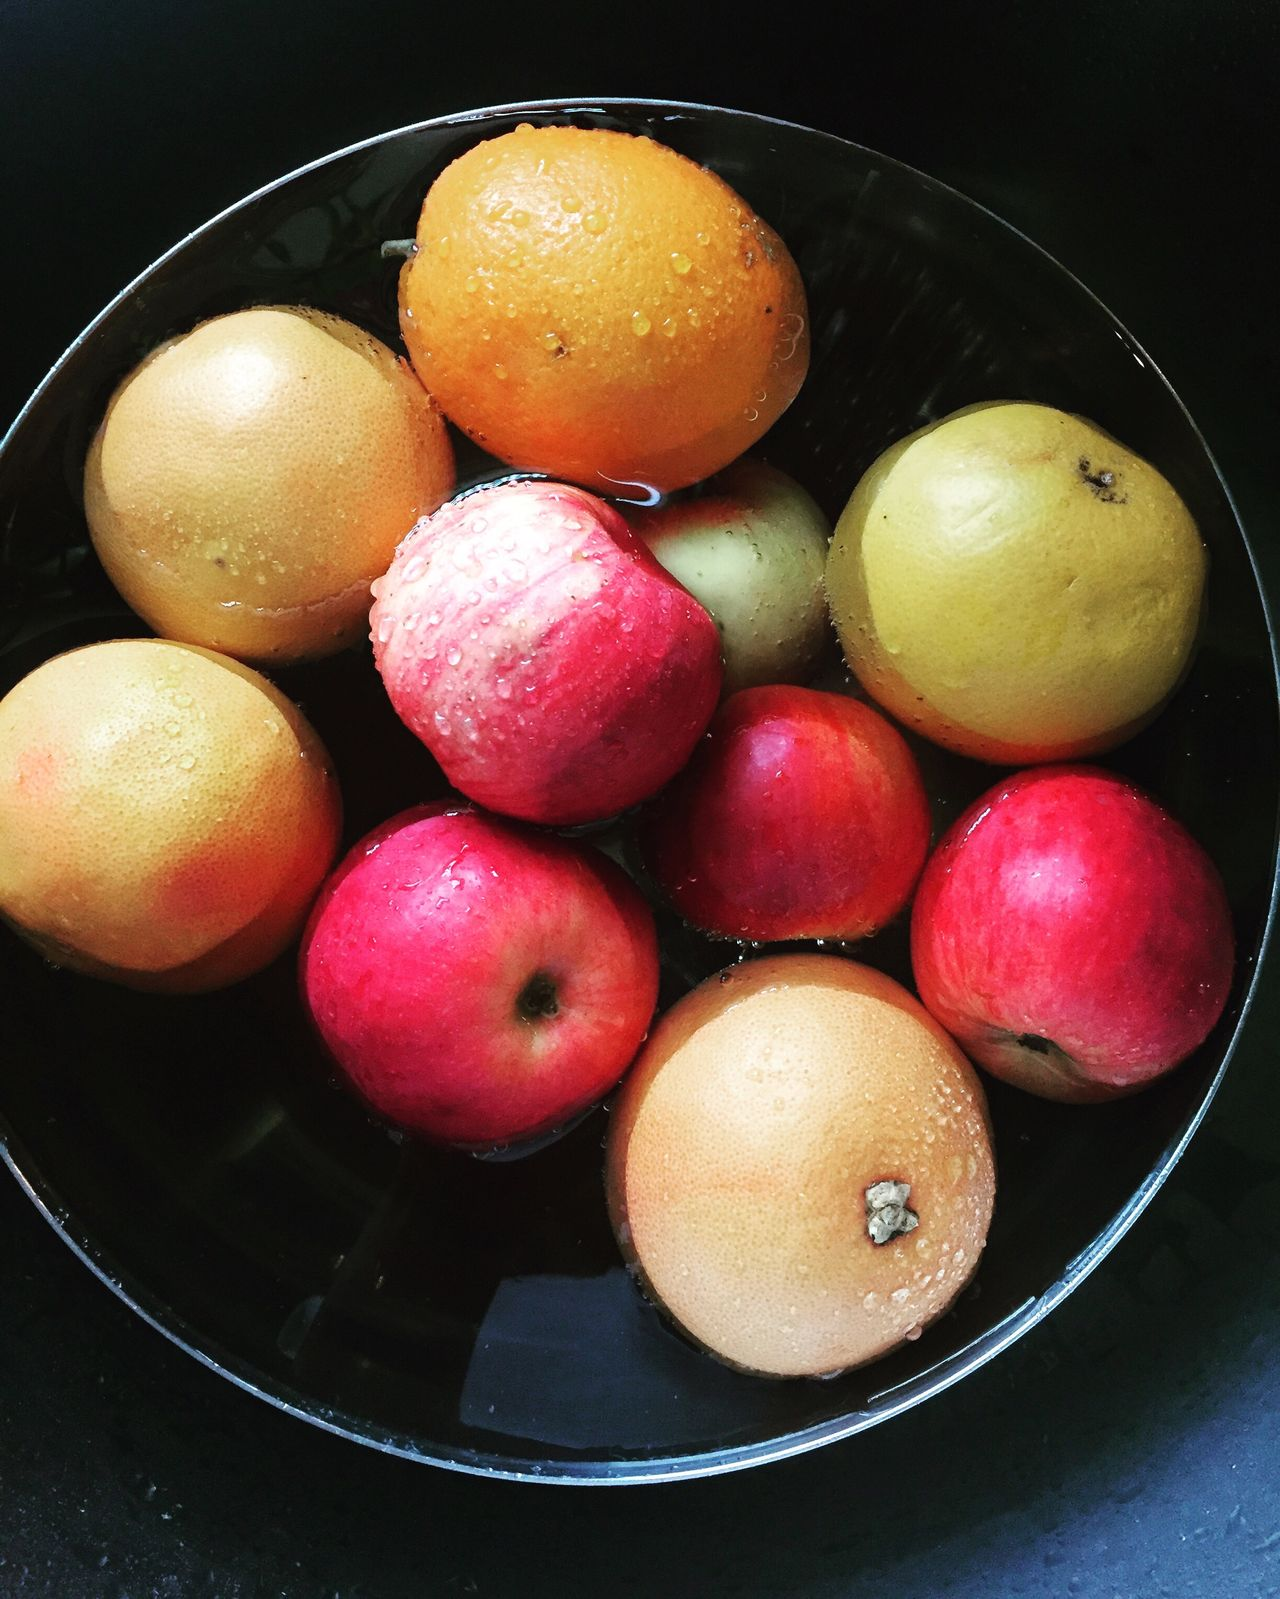 Fruit Fresh Fresh Fruit Fruit Bowl Food Preparation Honest Food Plantbased Raw Food Food Photography Apple Grapefruit View From Above Washing Produce Fresh Produce Healthy Food